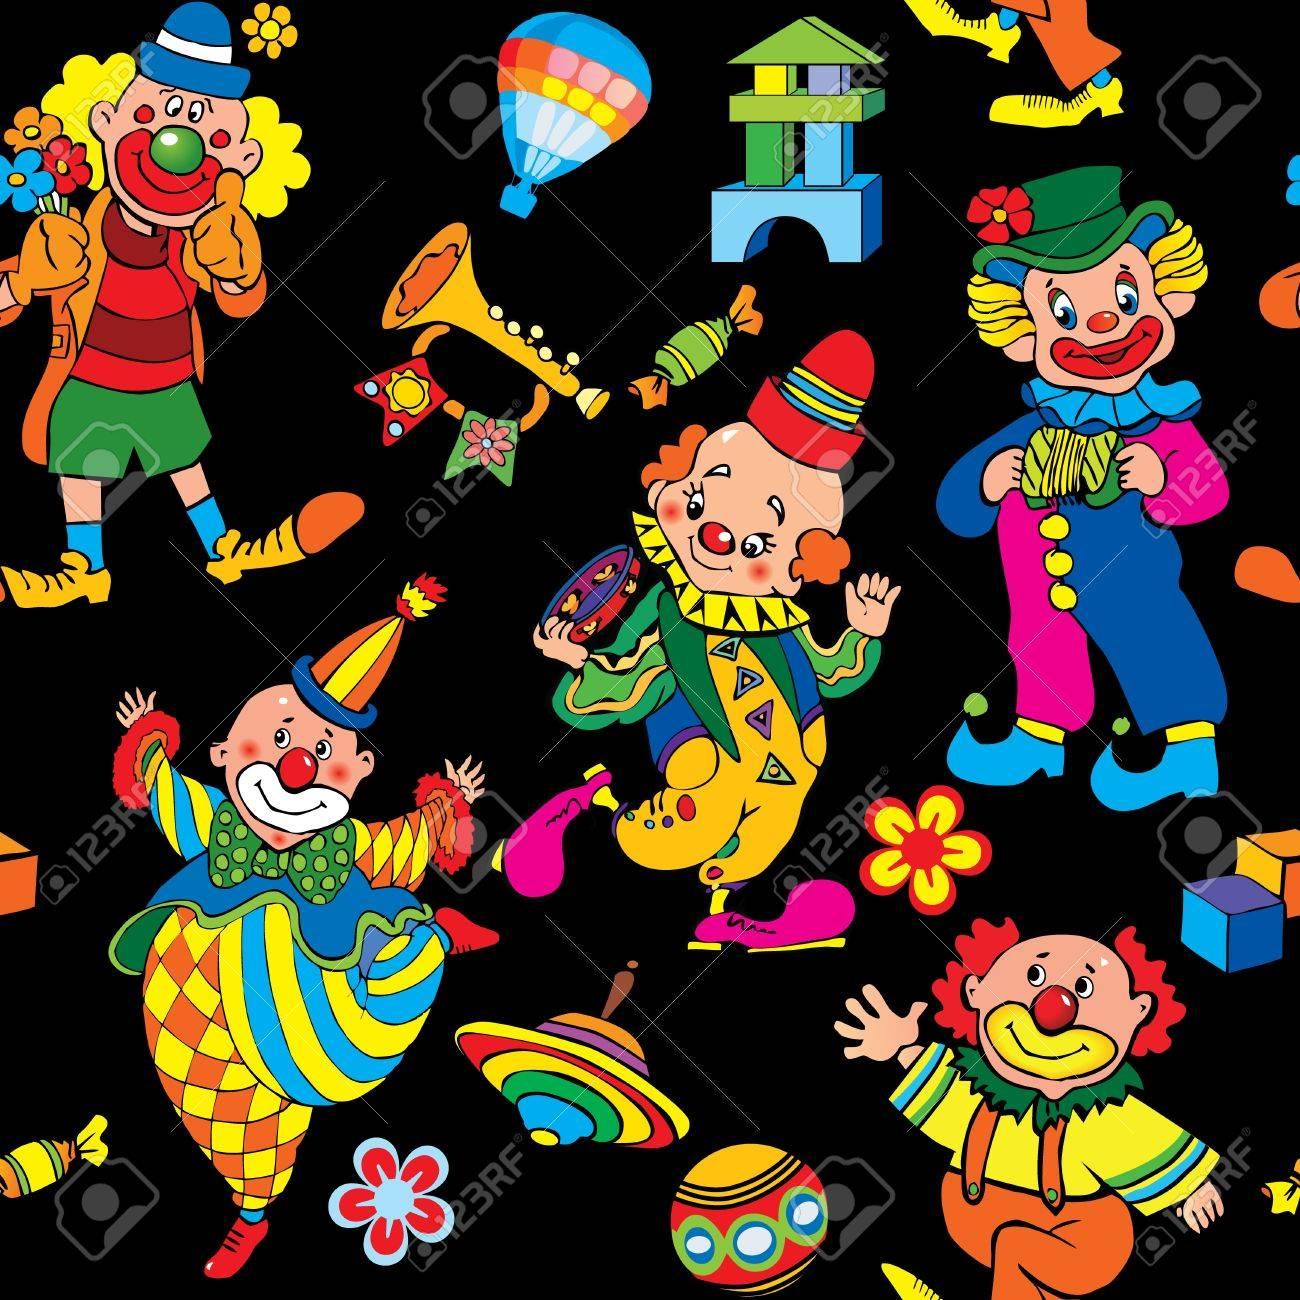 Cartoon circus seamless pattern art-illustration on a black background Stock Vector - 15067570